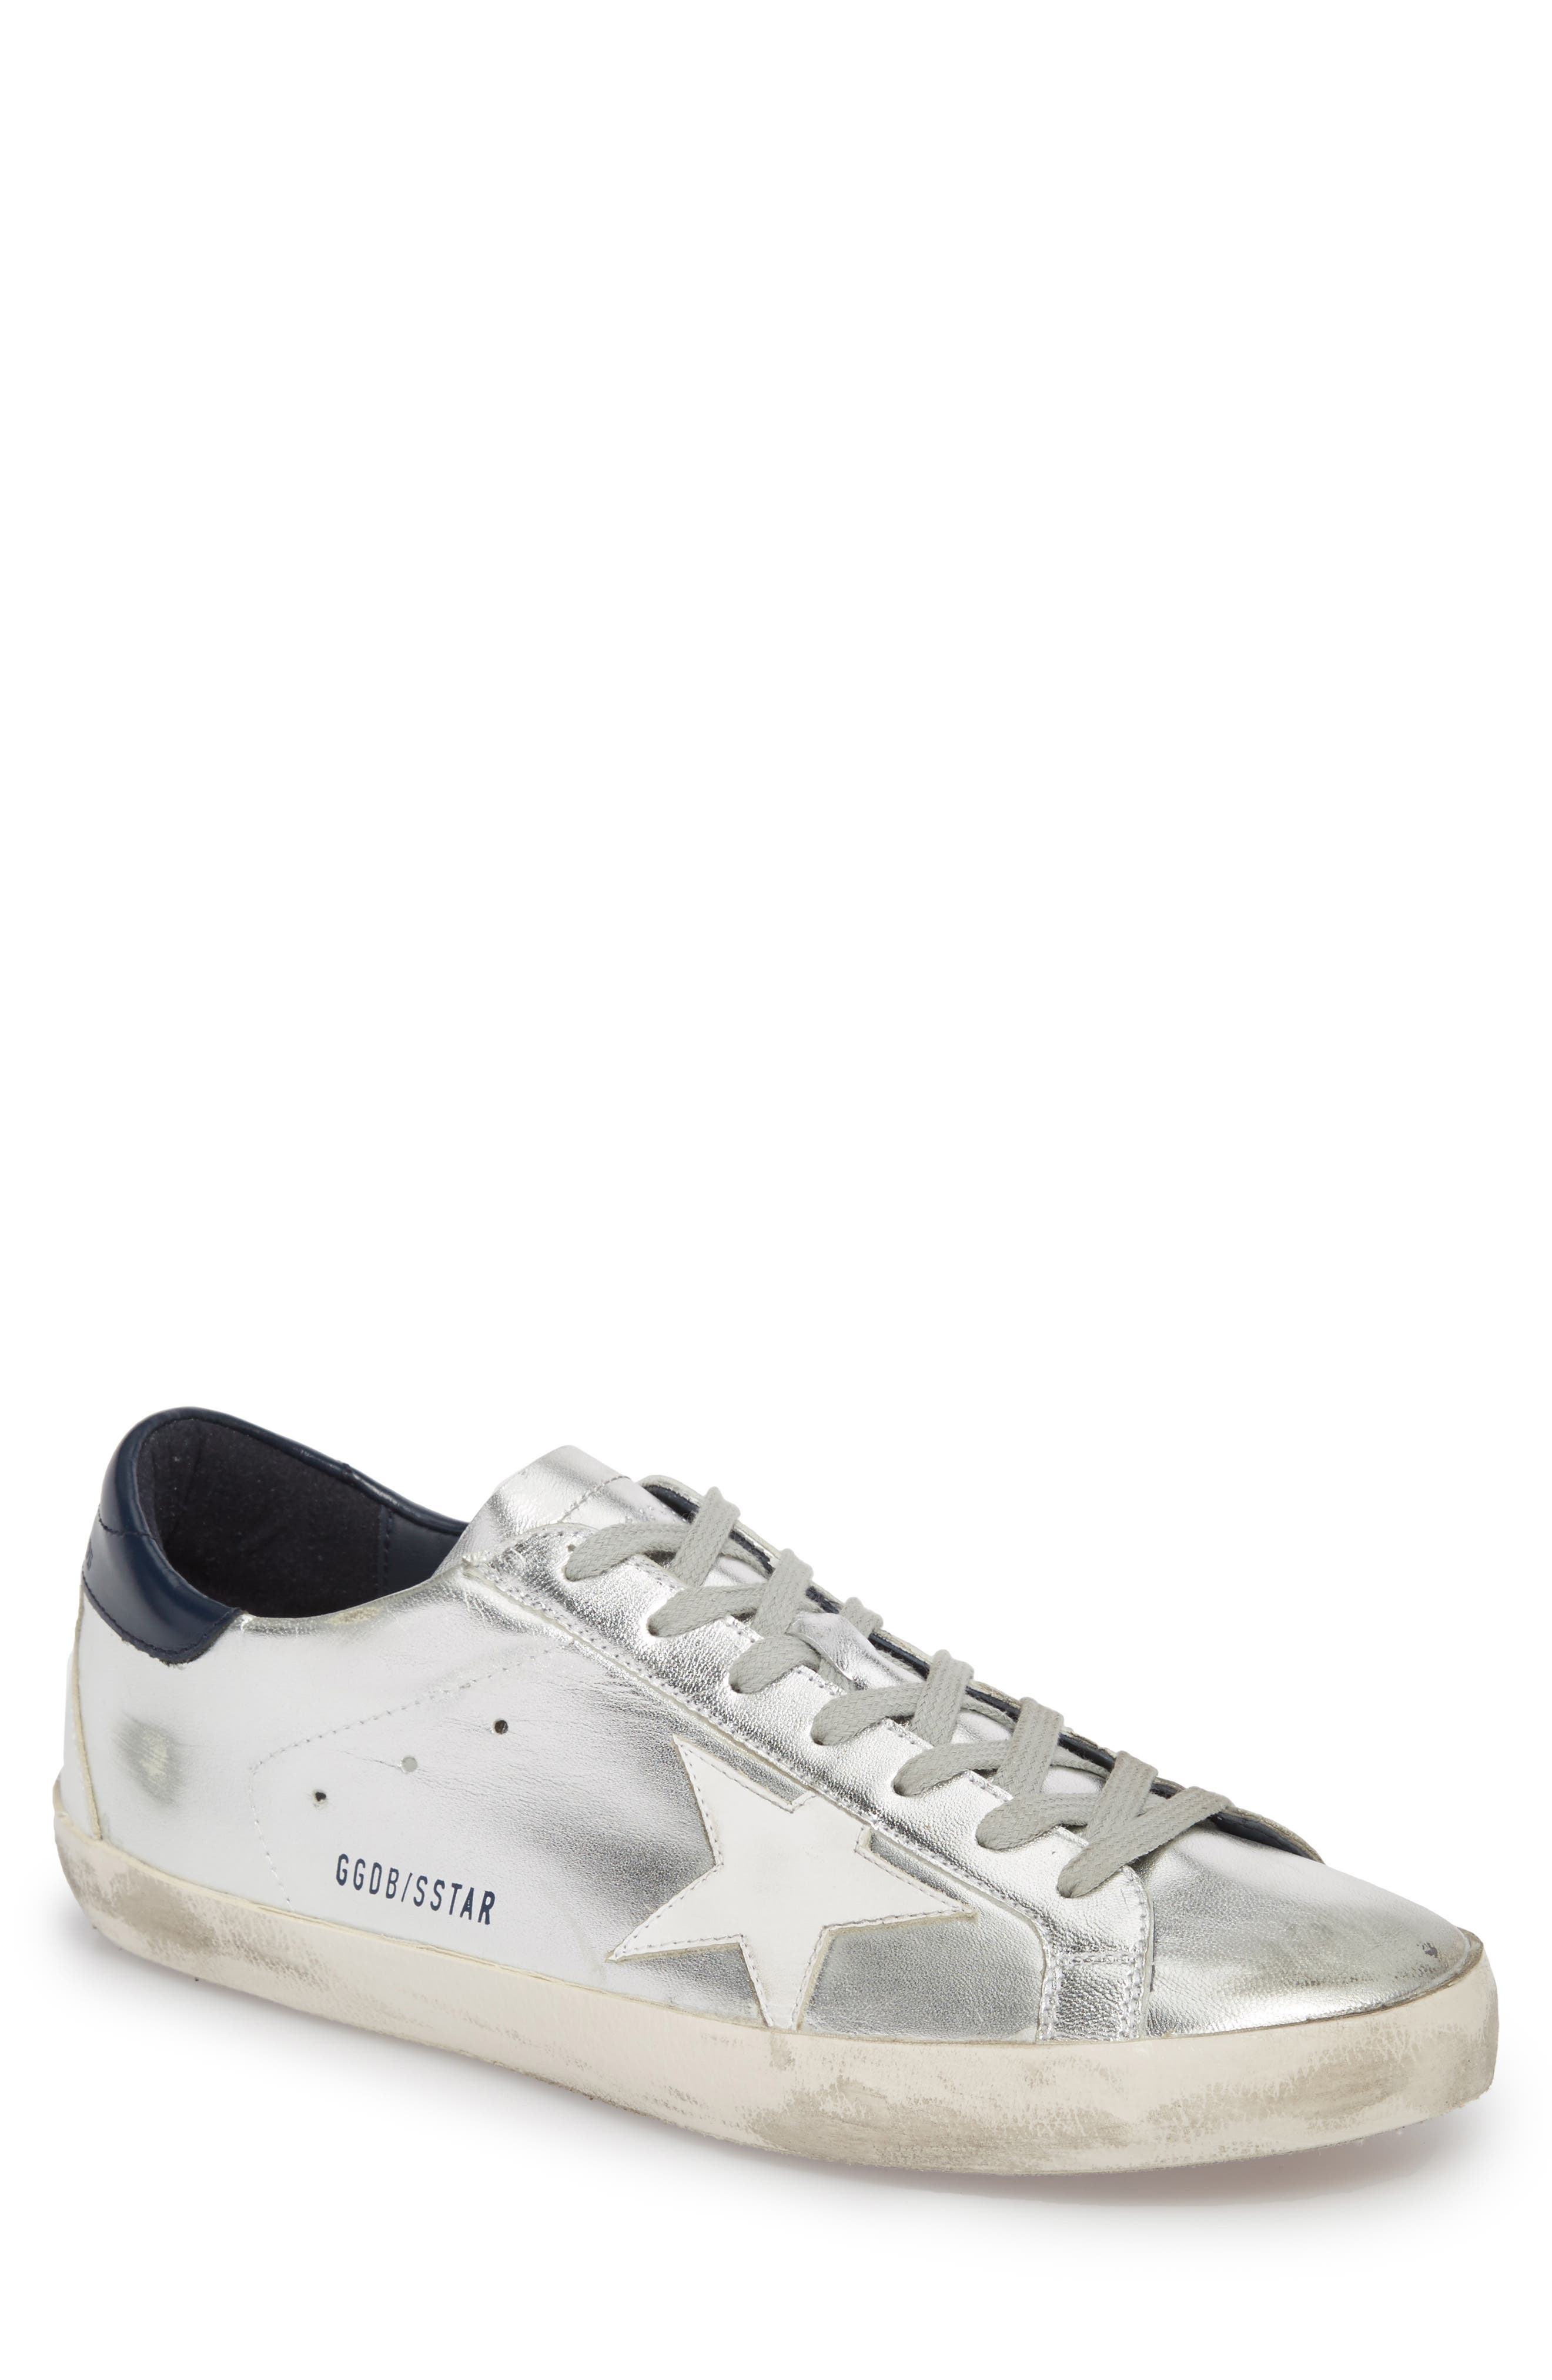 Alternate Image 1 Selected - Golden Goose 'Superstar' Sneaker (Men)